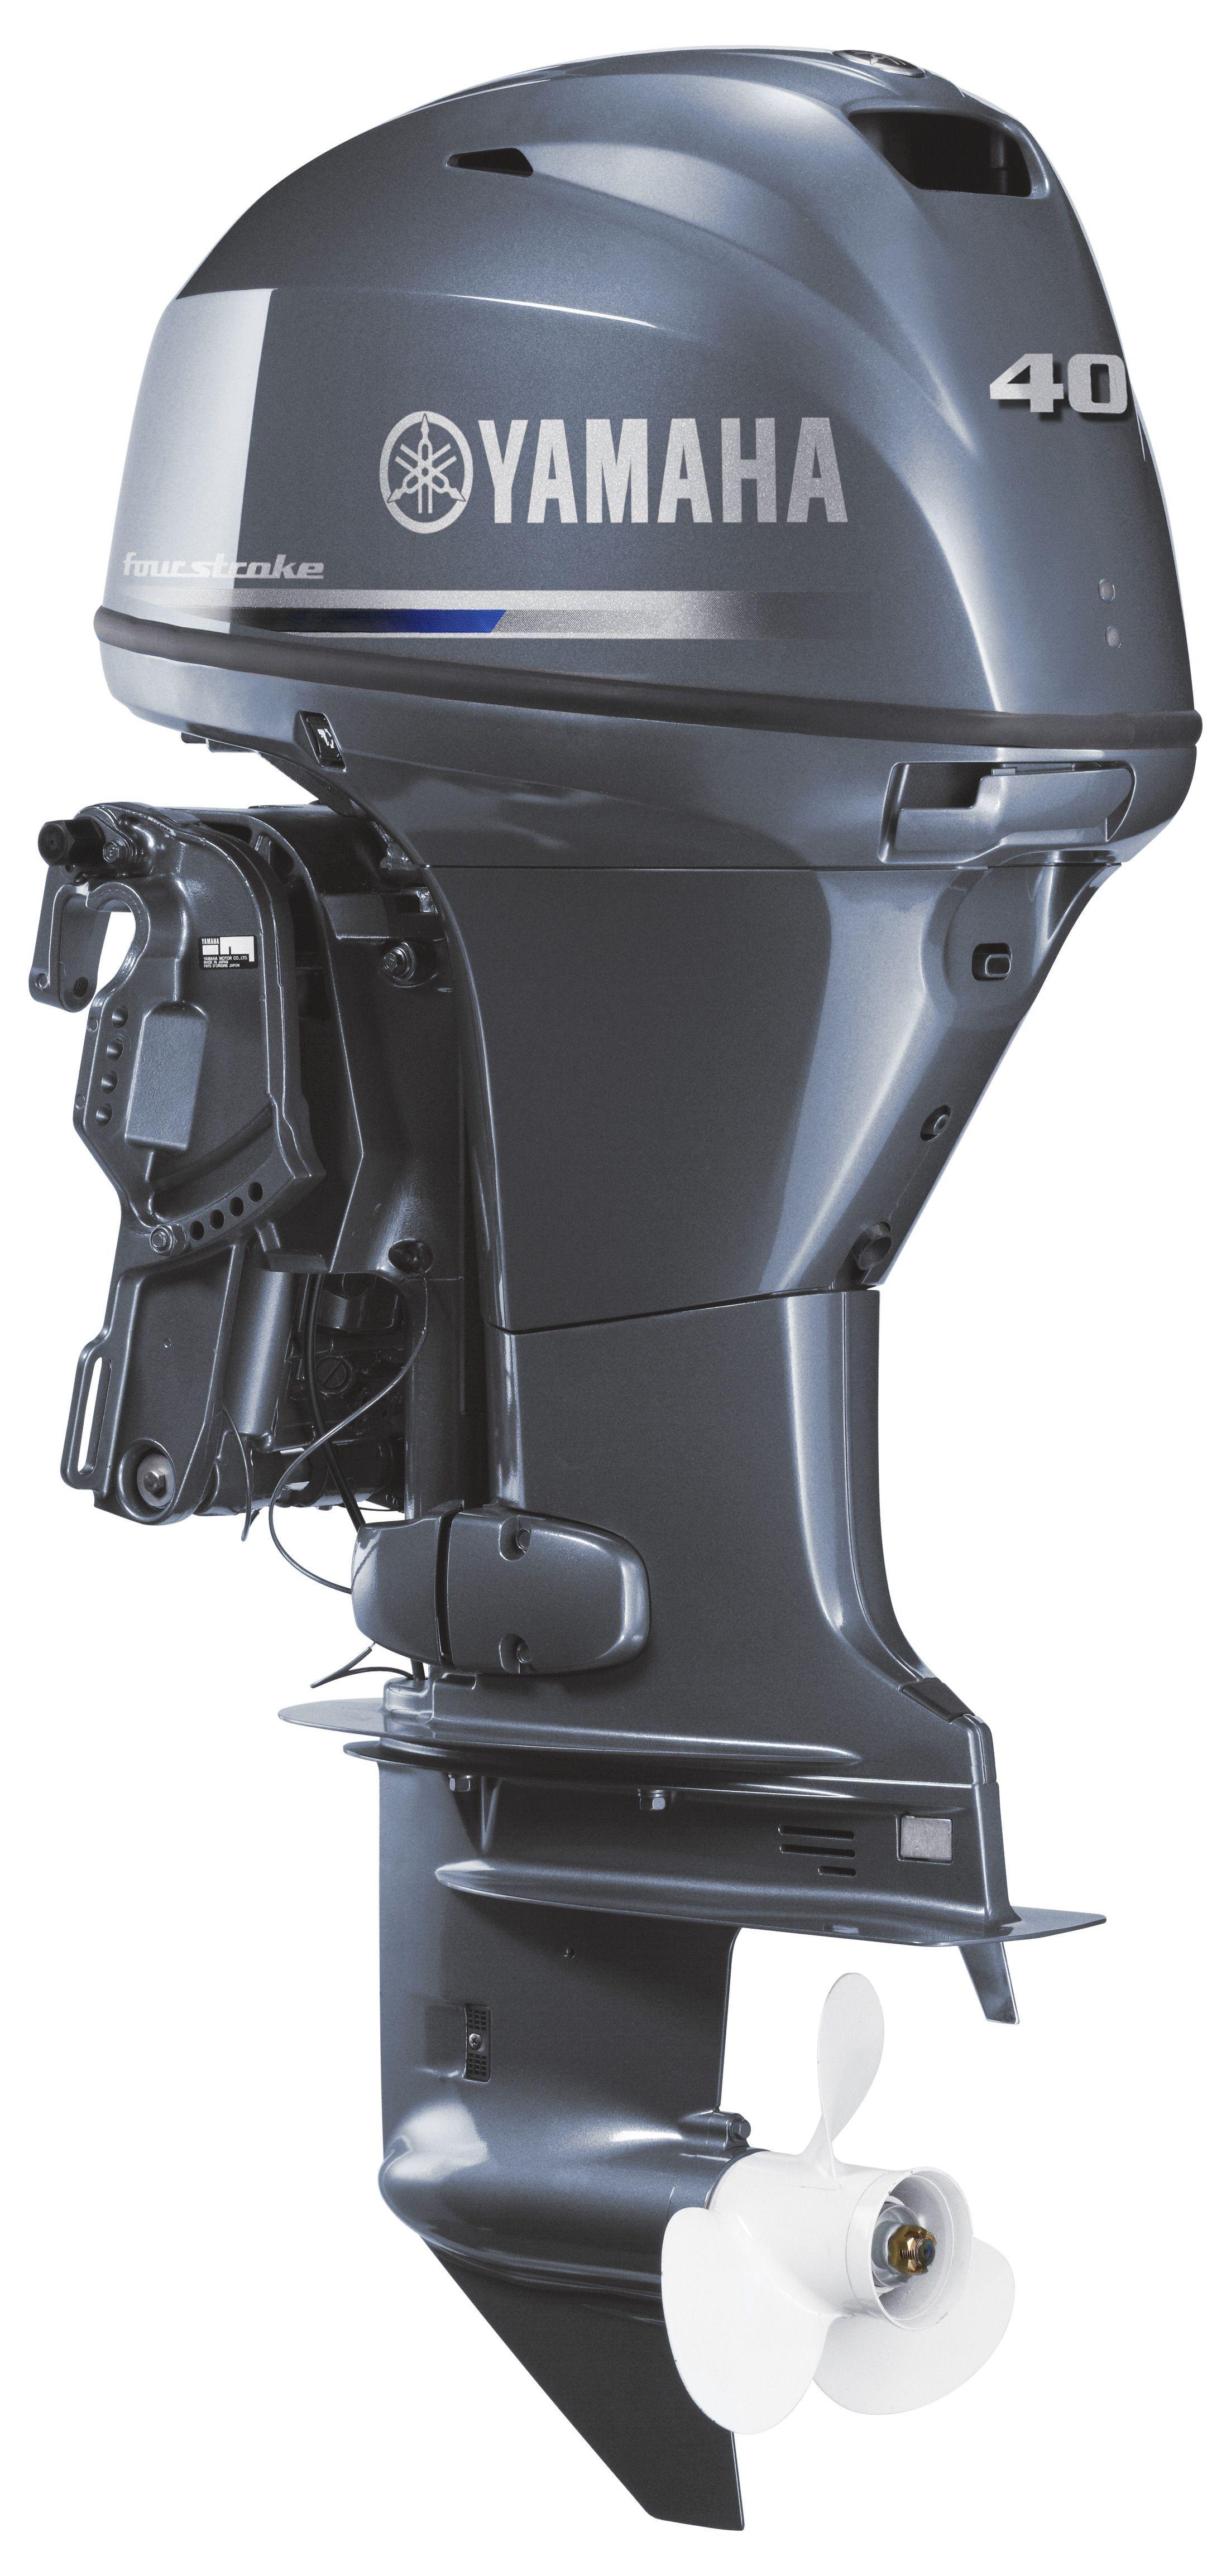 Review,yamaha 40 hp outboard,yamaha 40 hp outboard 2 stroke,yamaha